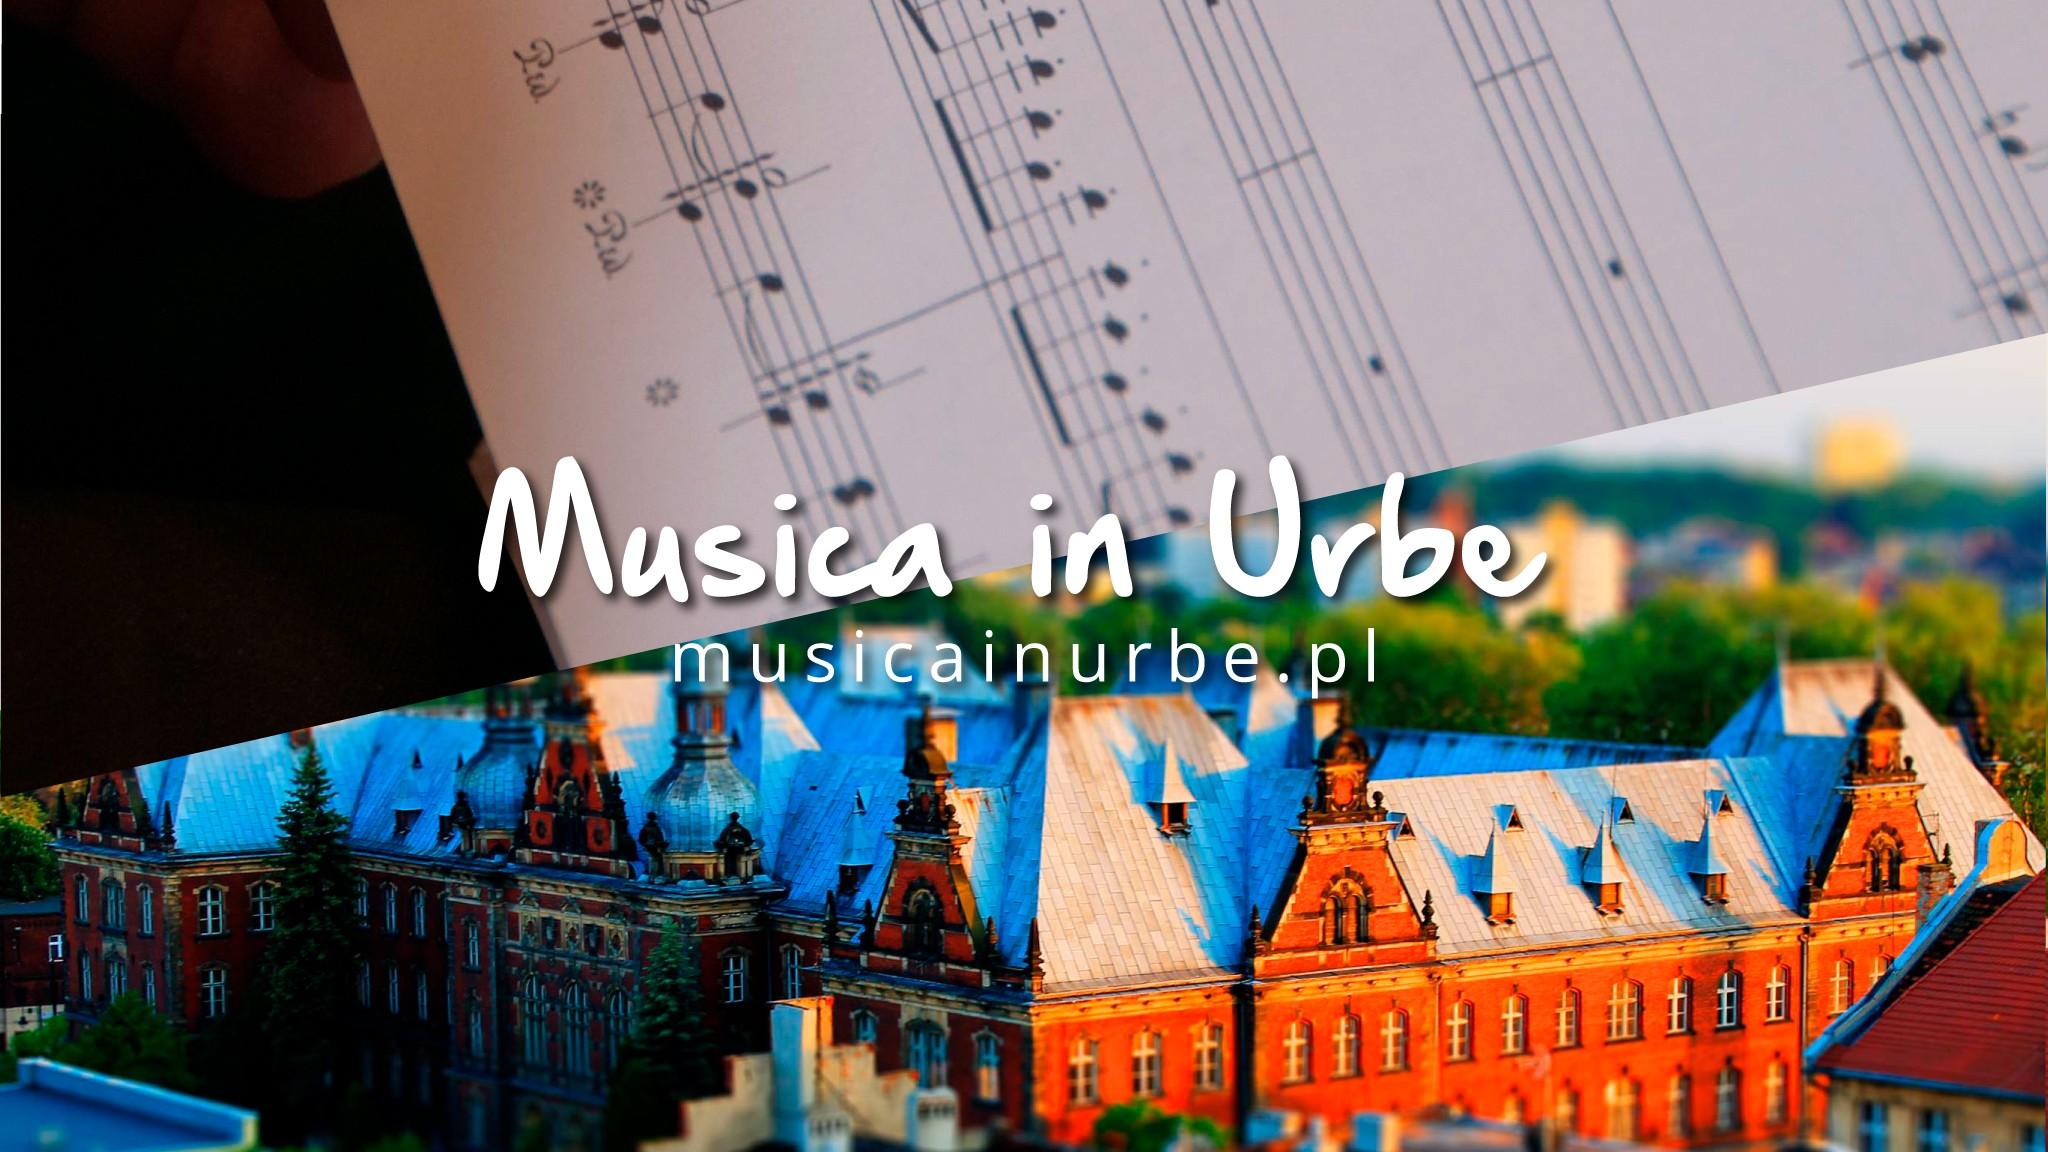 Musica in urbe